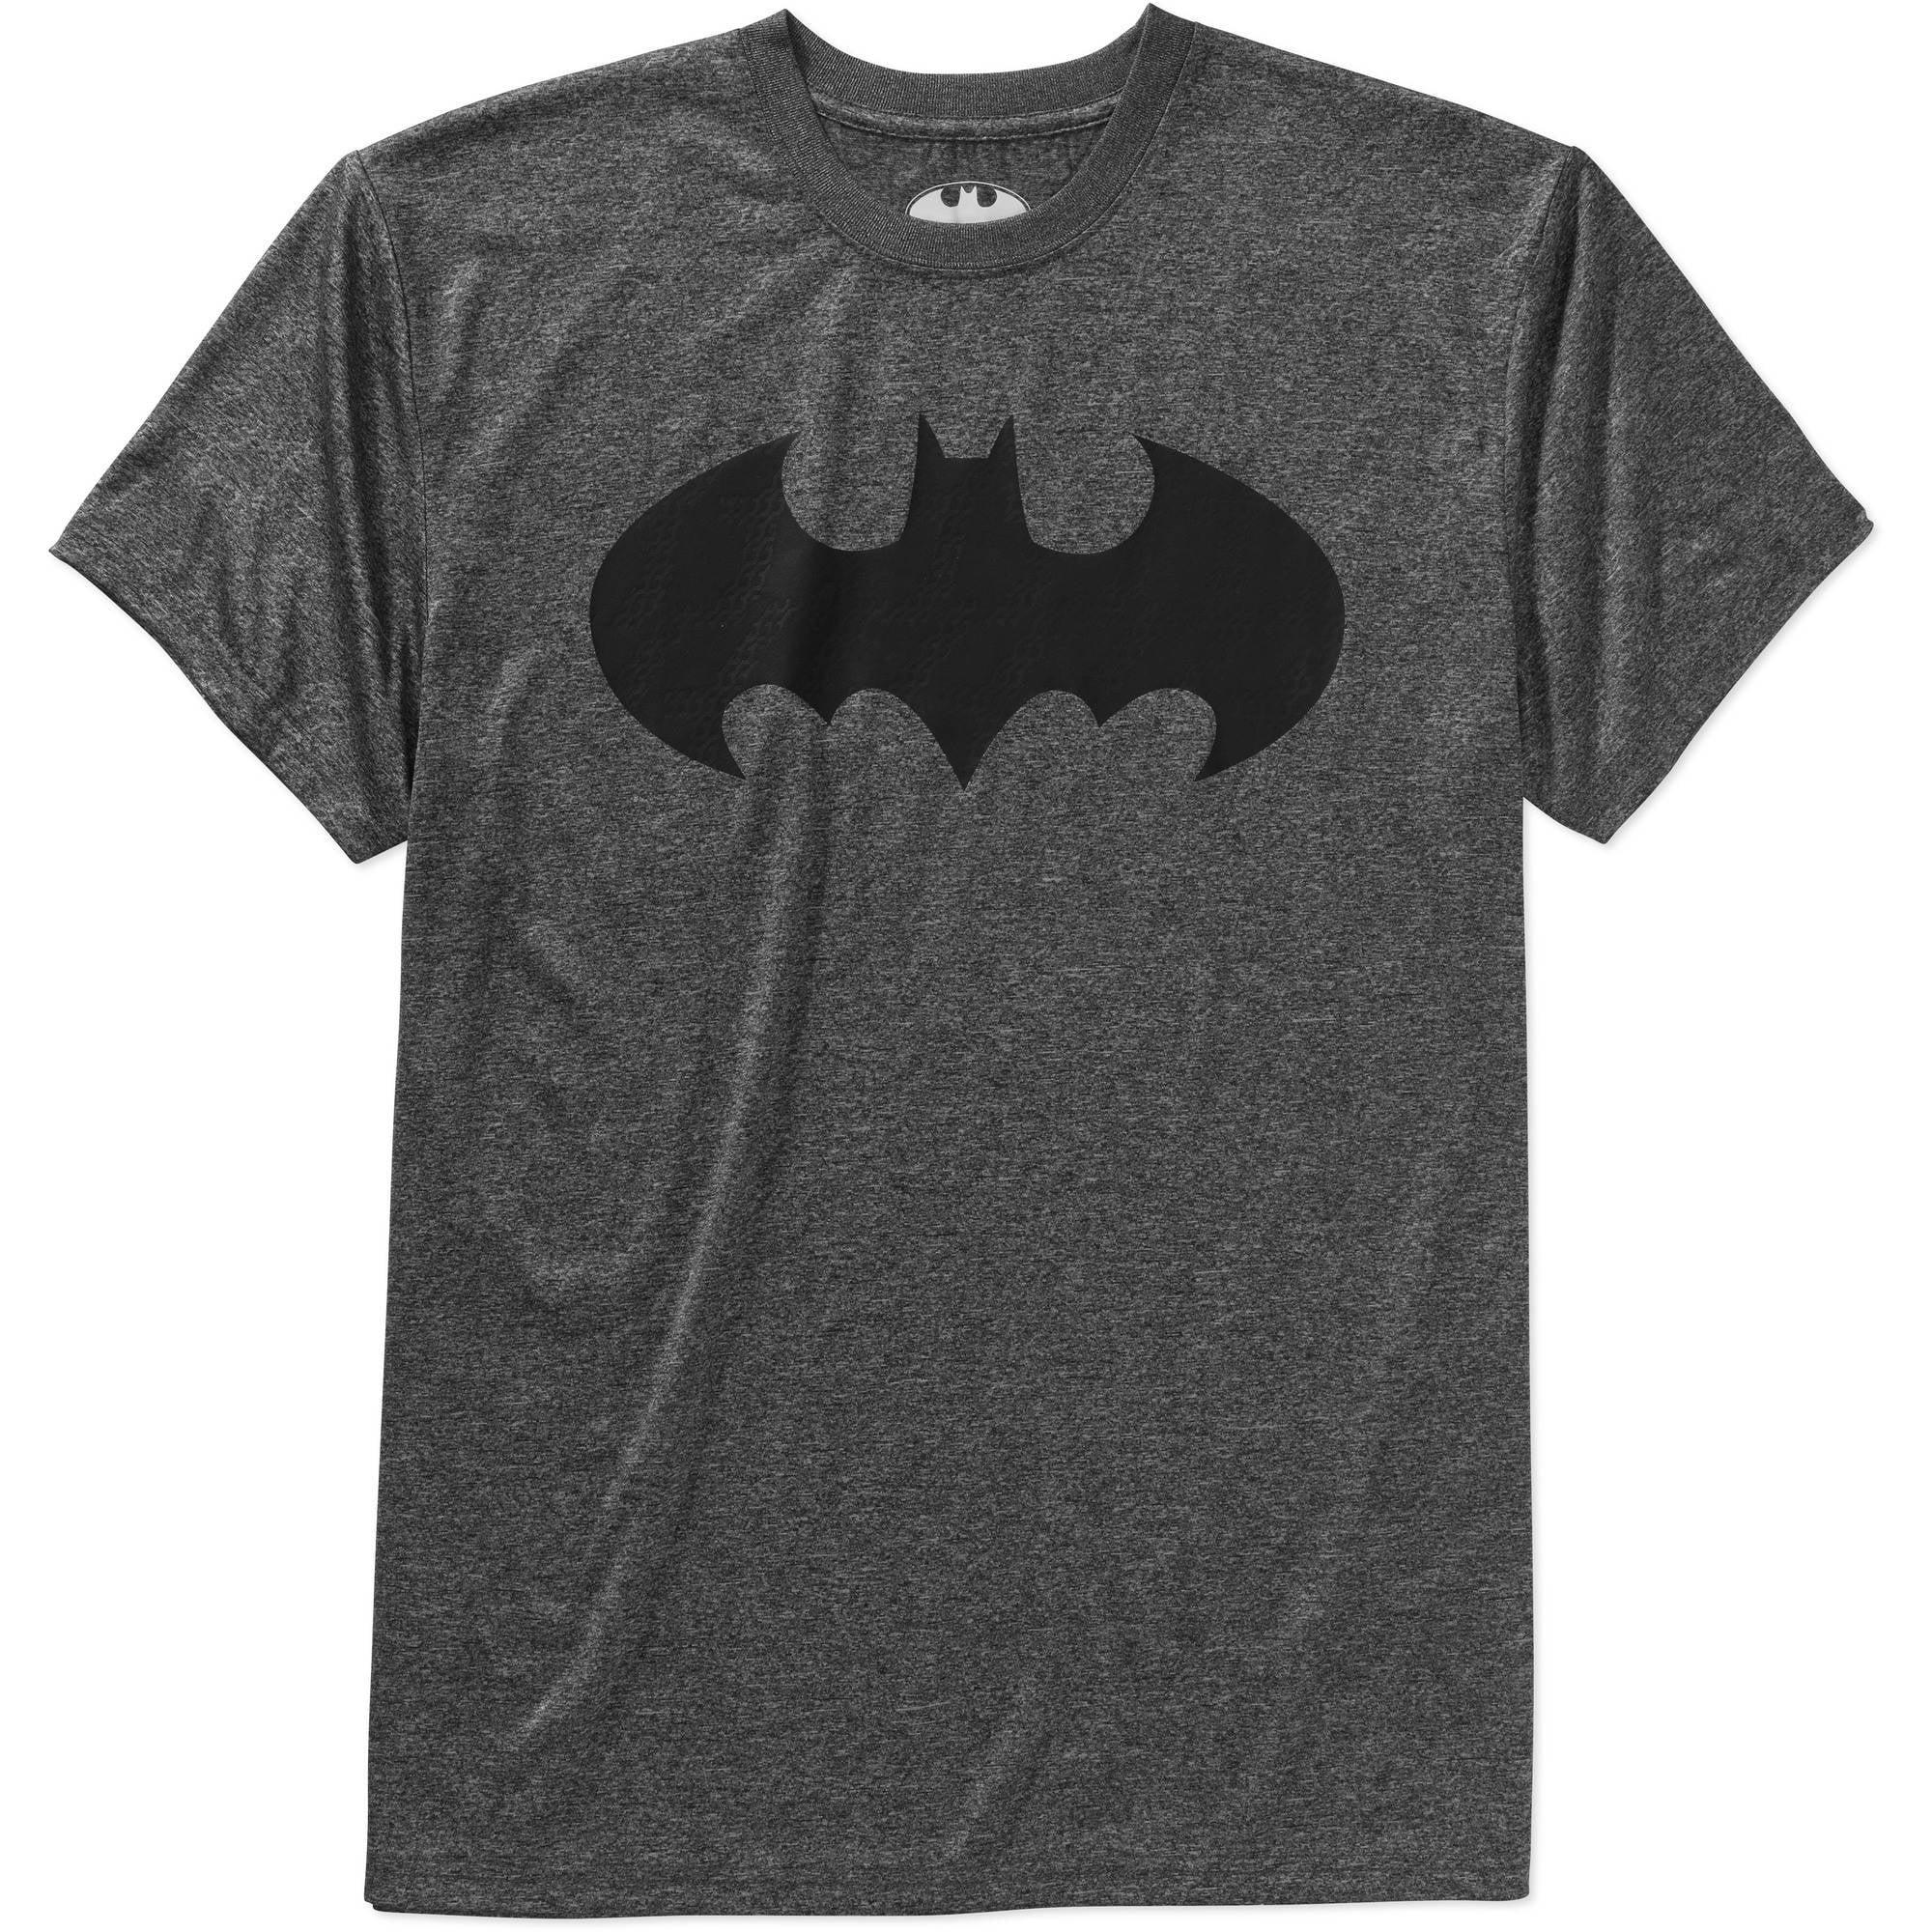 Batman logo cationic Big Men's poly graphic tee